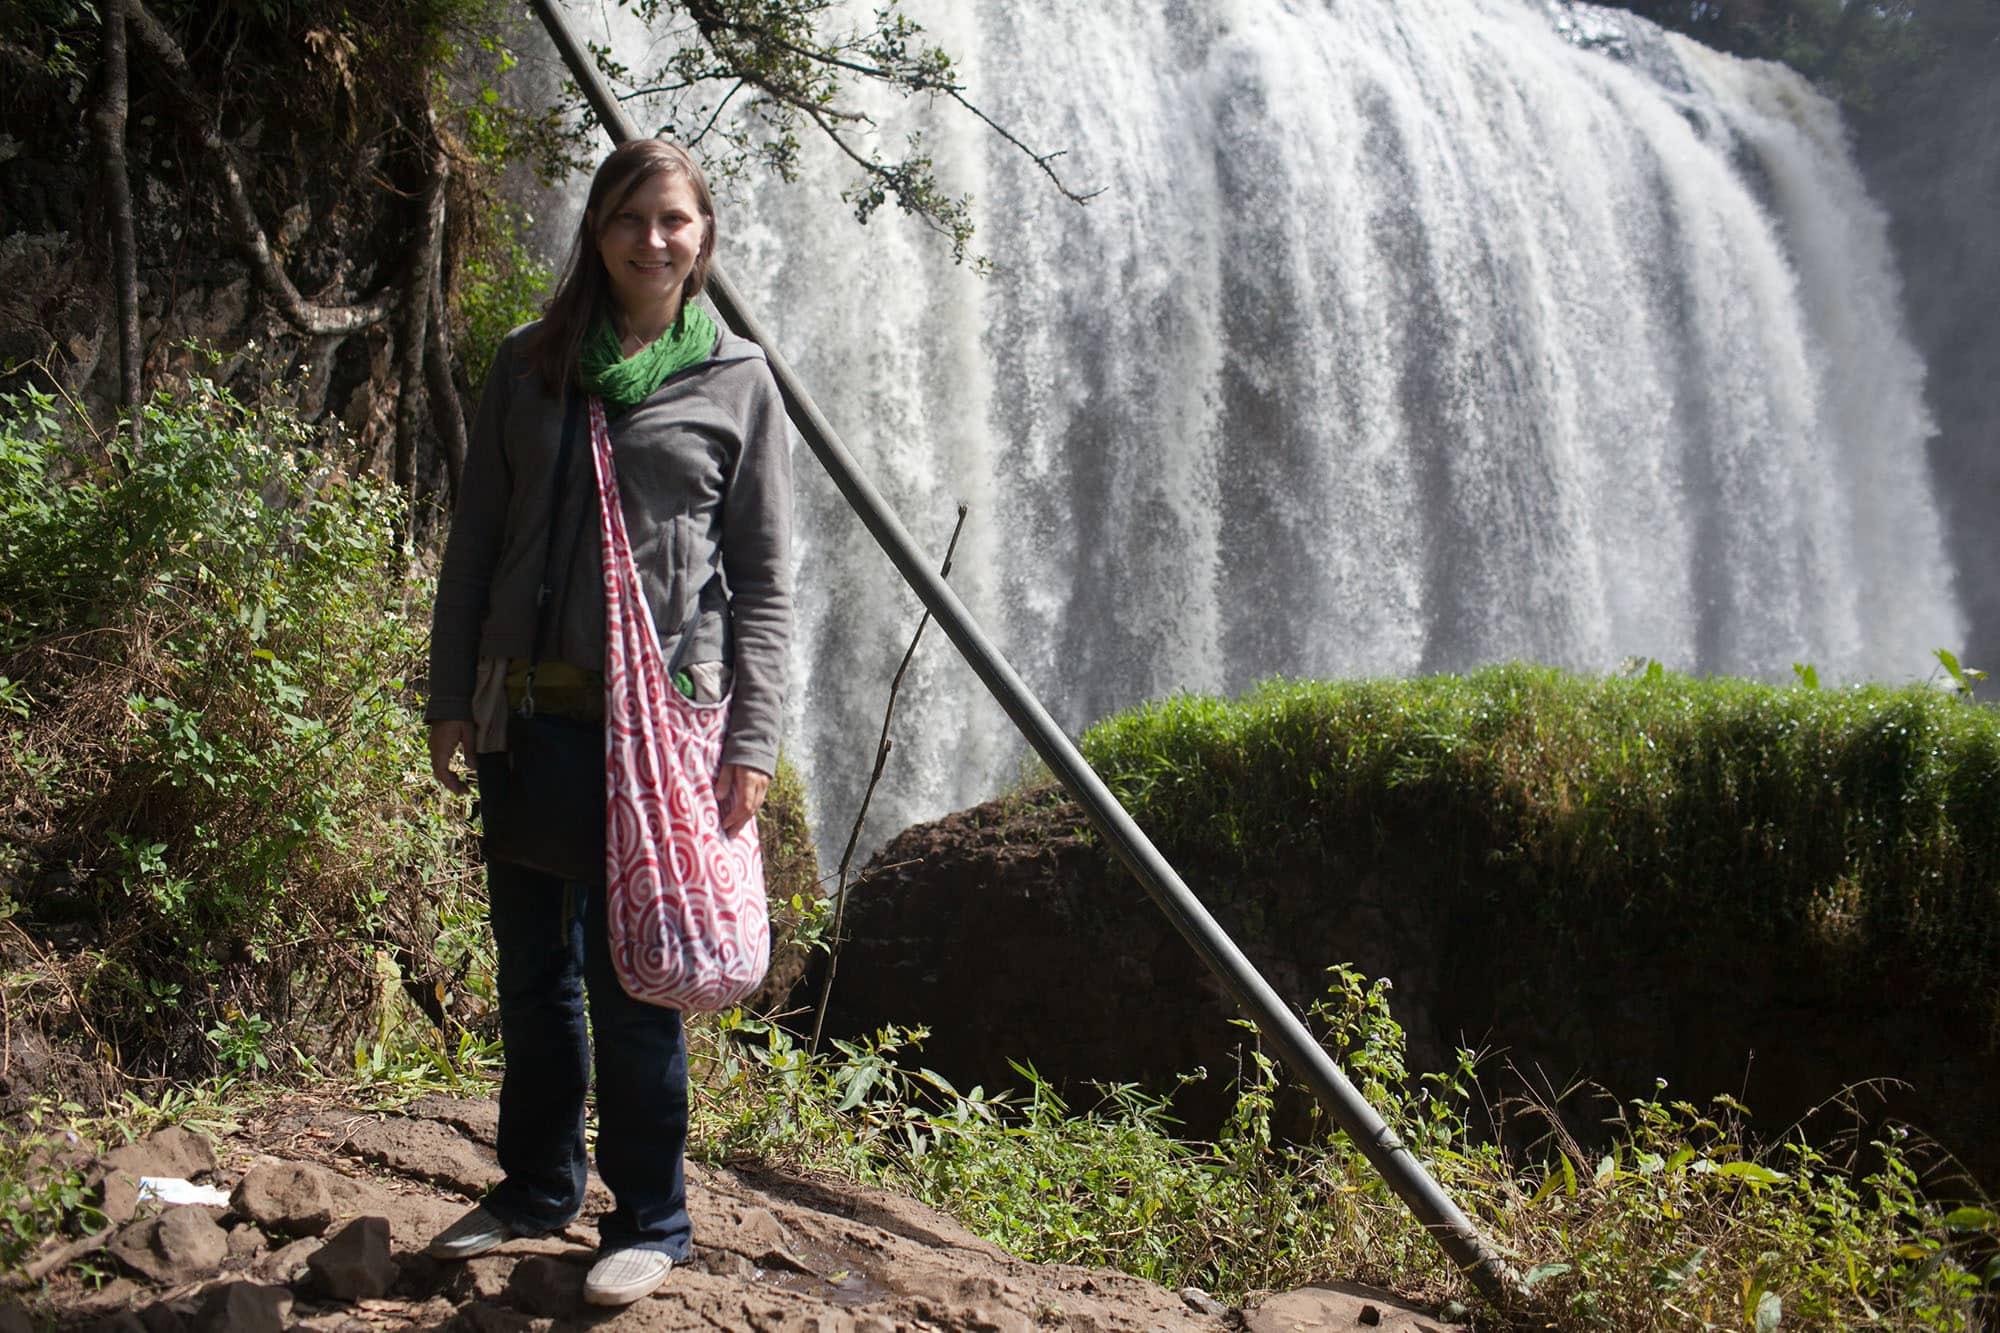 Elephant waterfall in Dalat, Vietnam - Dalat Countryside Tour in Vietnam